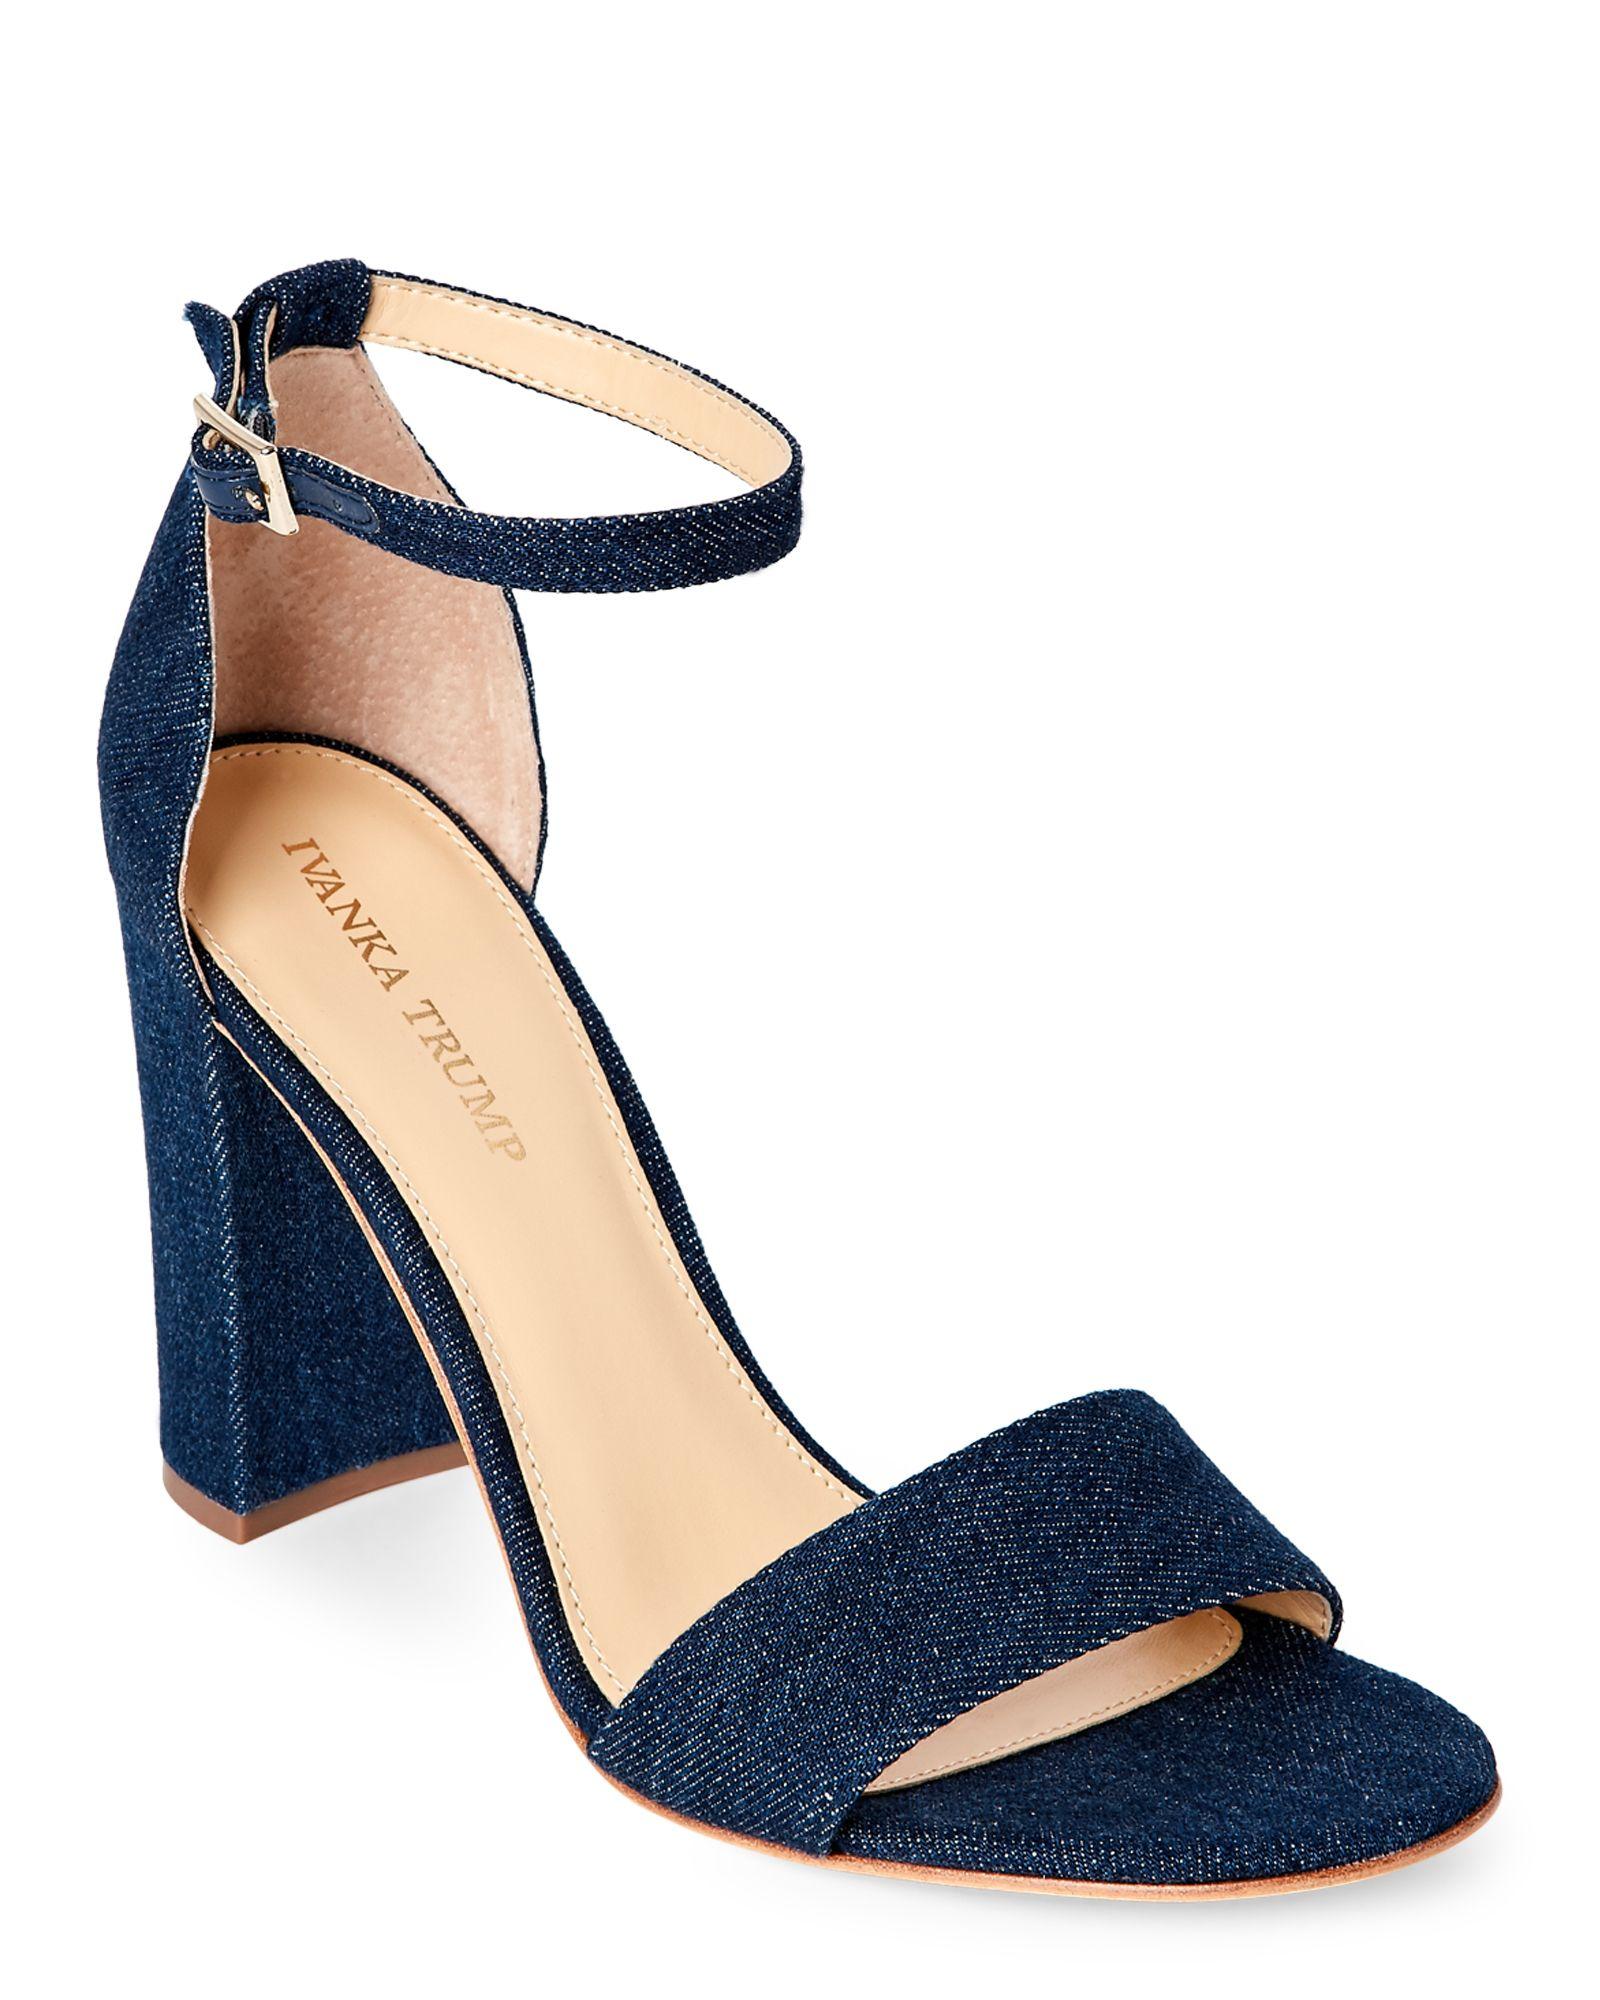 ivanka trump shoes block heels pinterest everything 736281